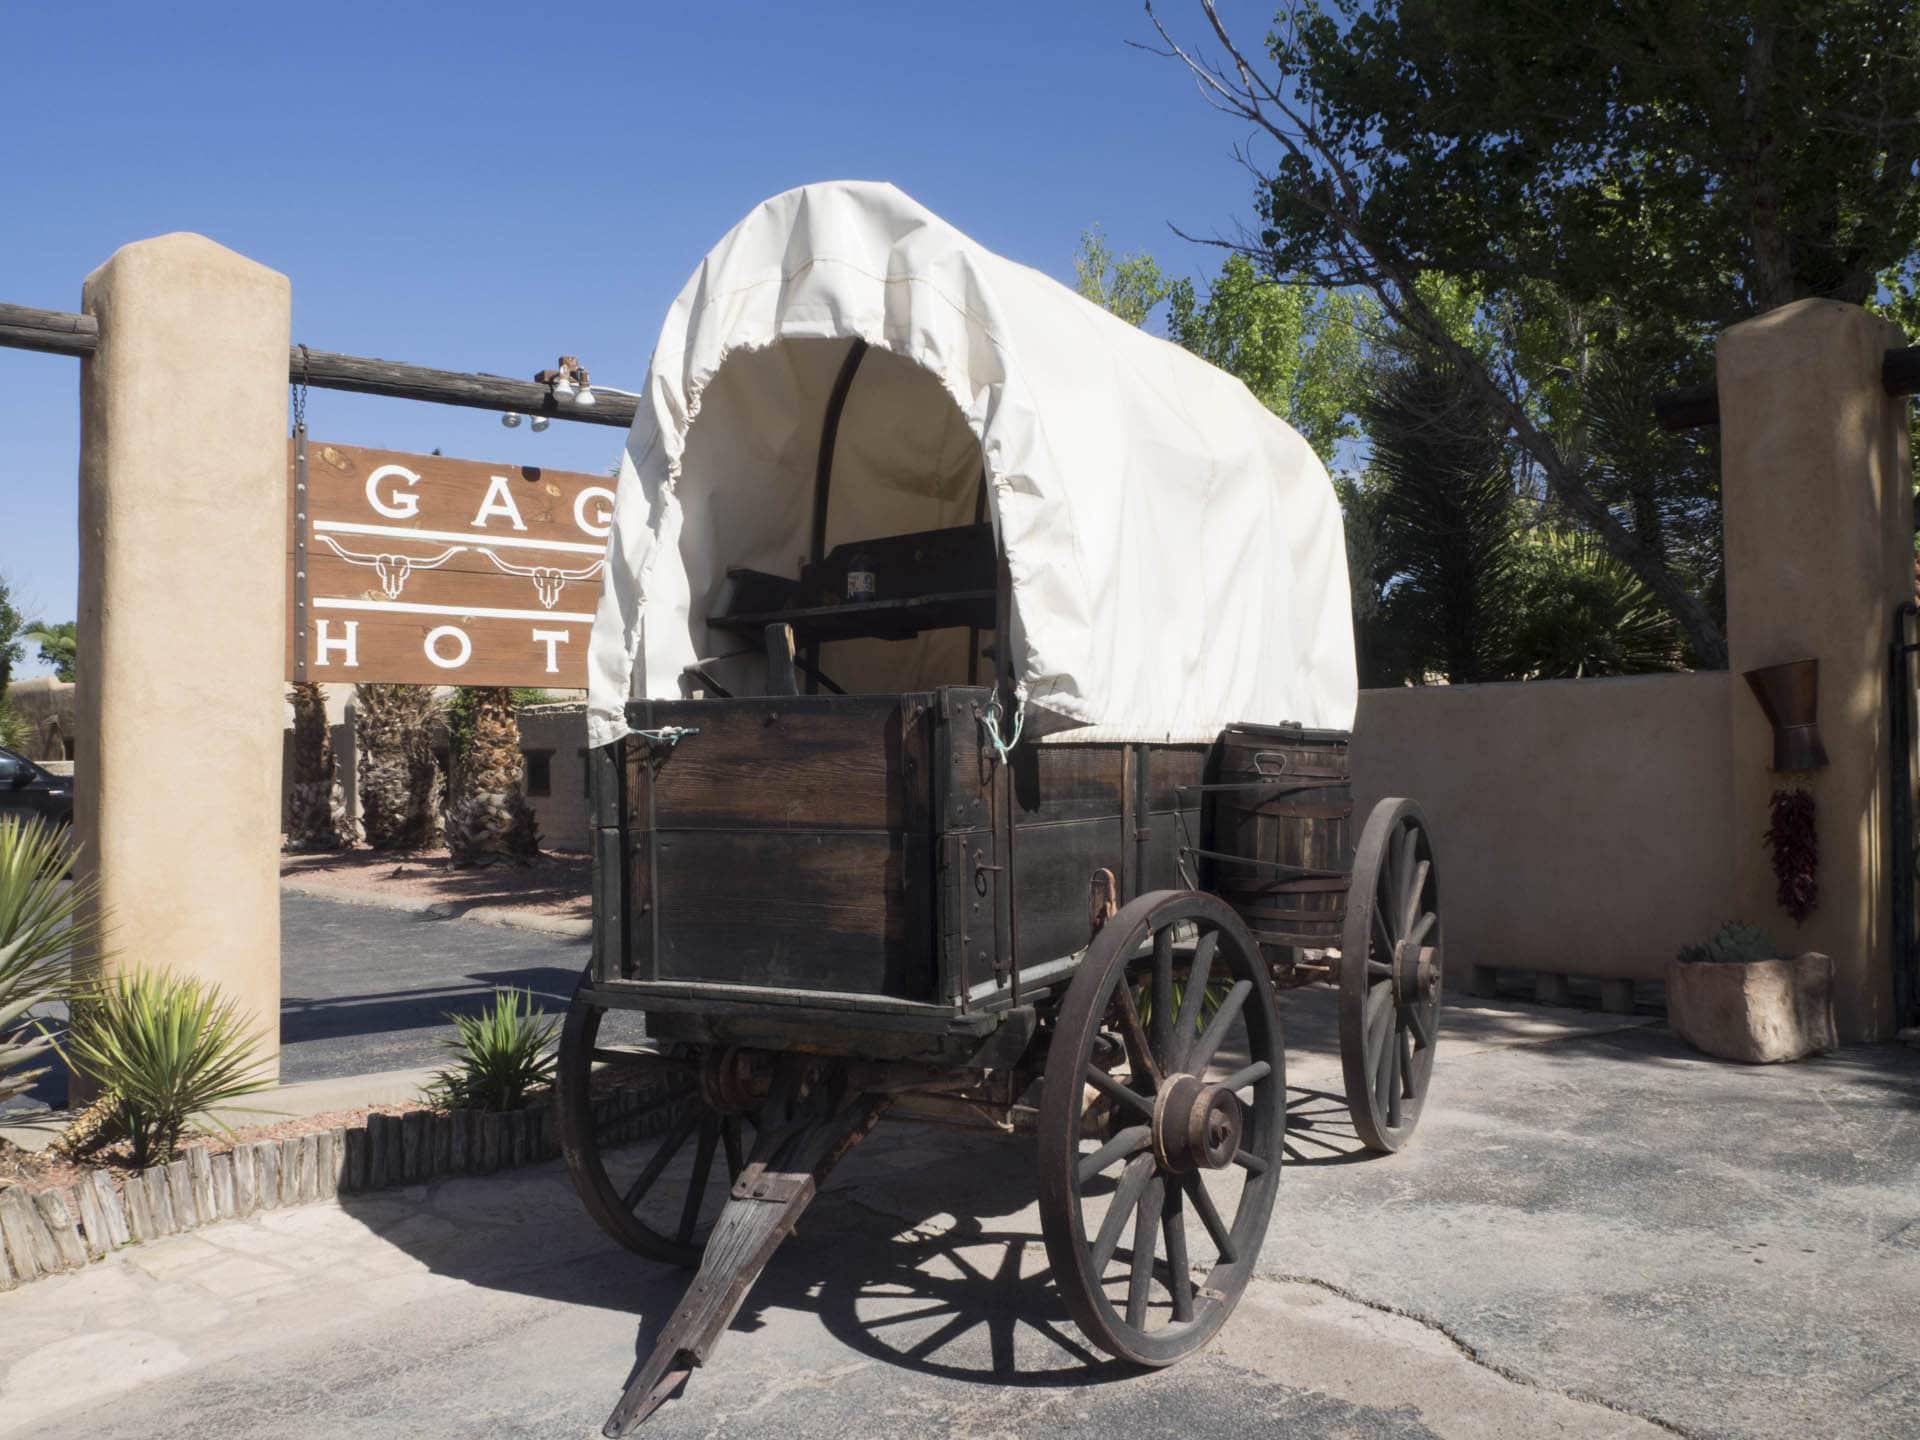 The legendary Gage Hotel in Marathon, Texas